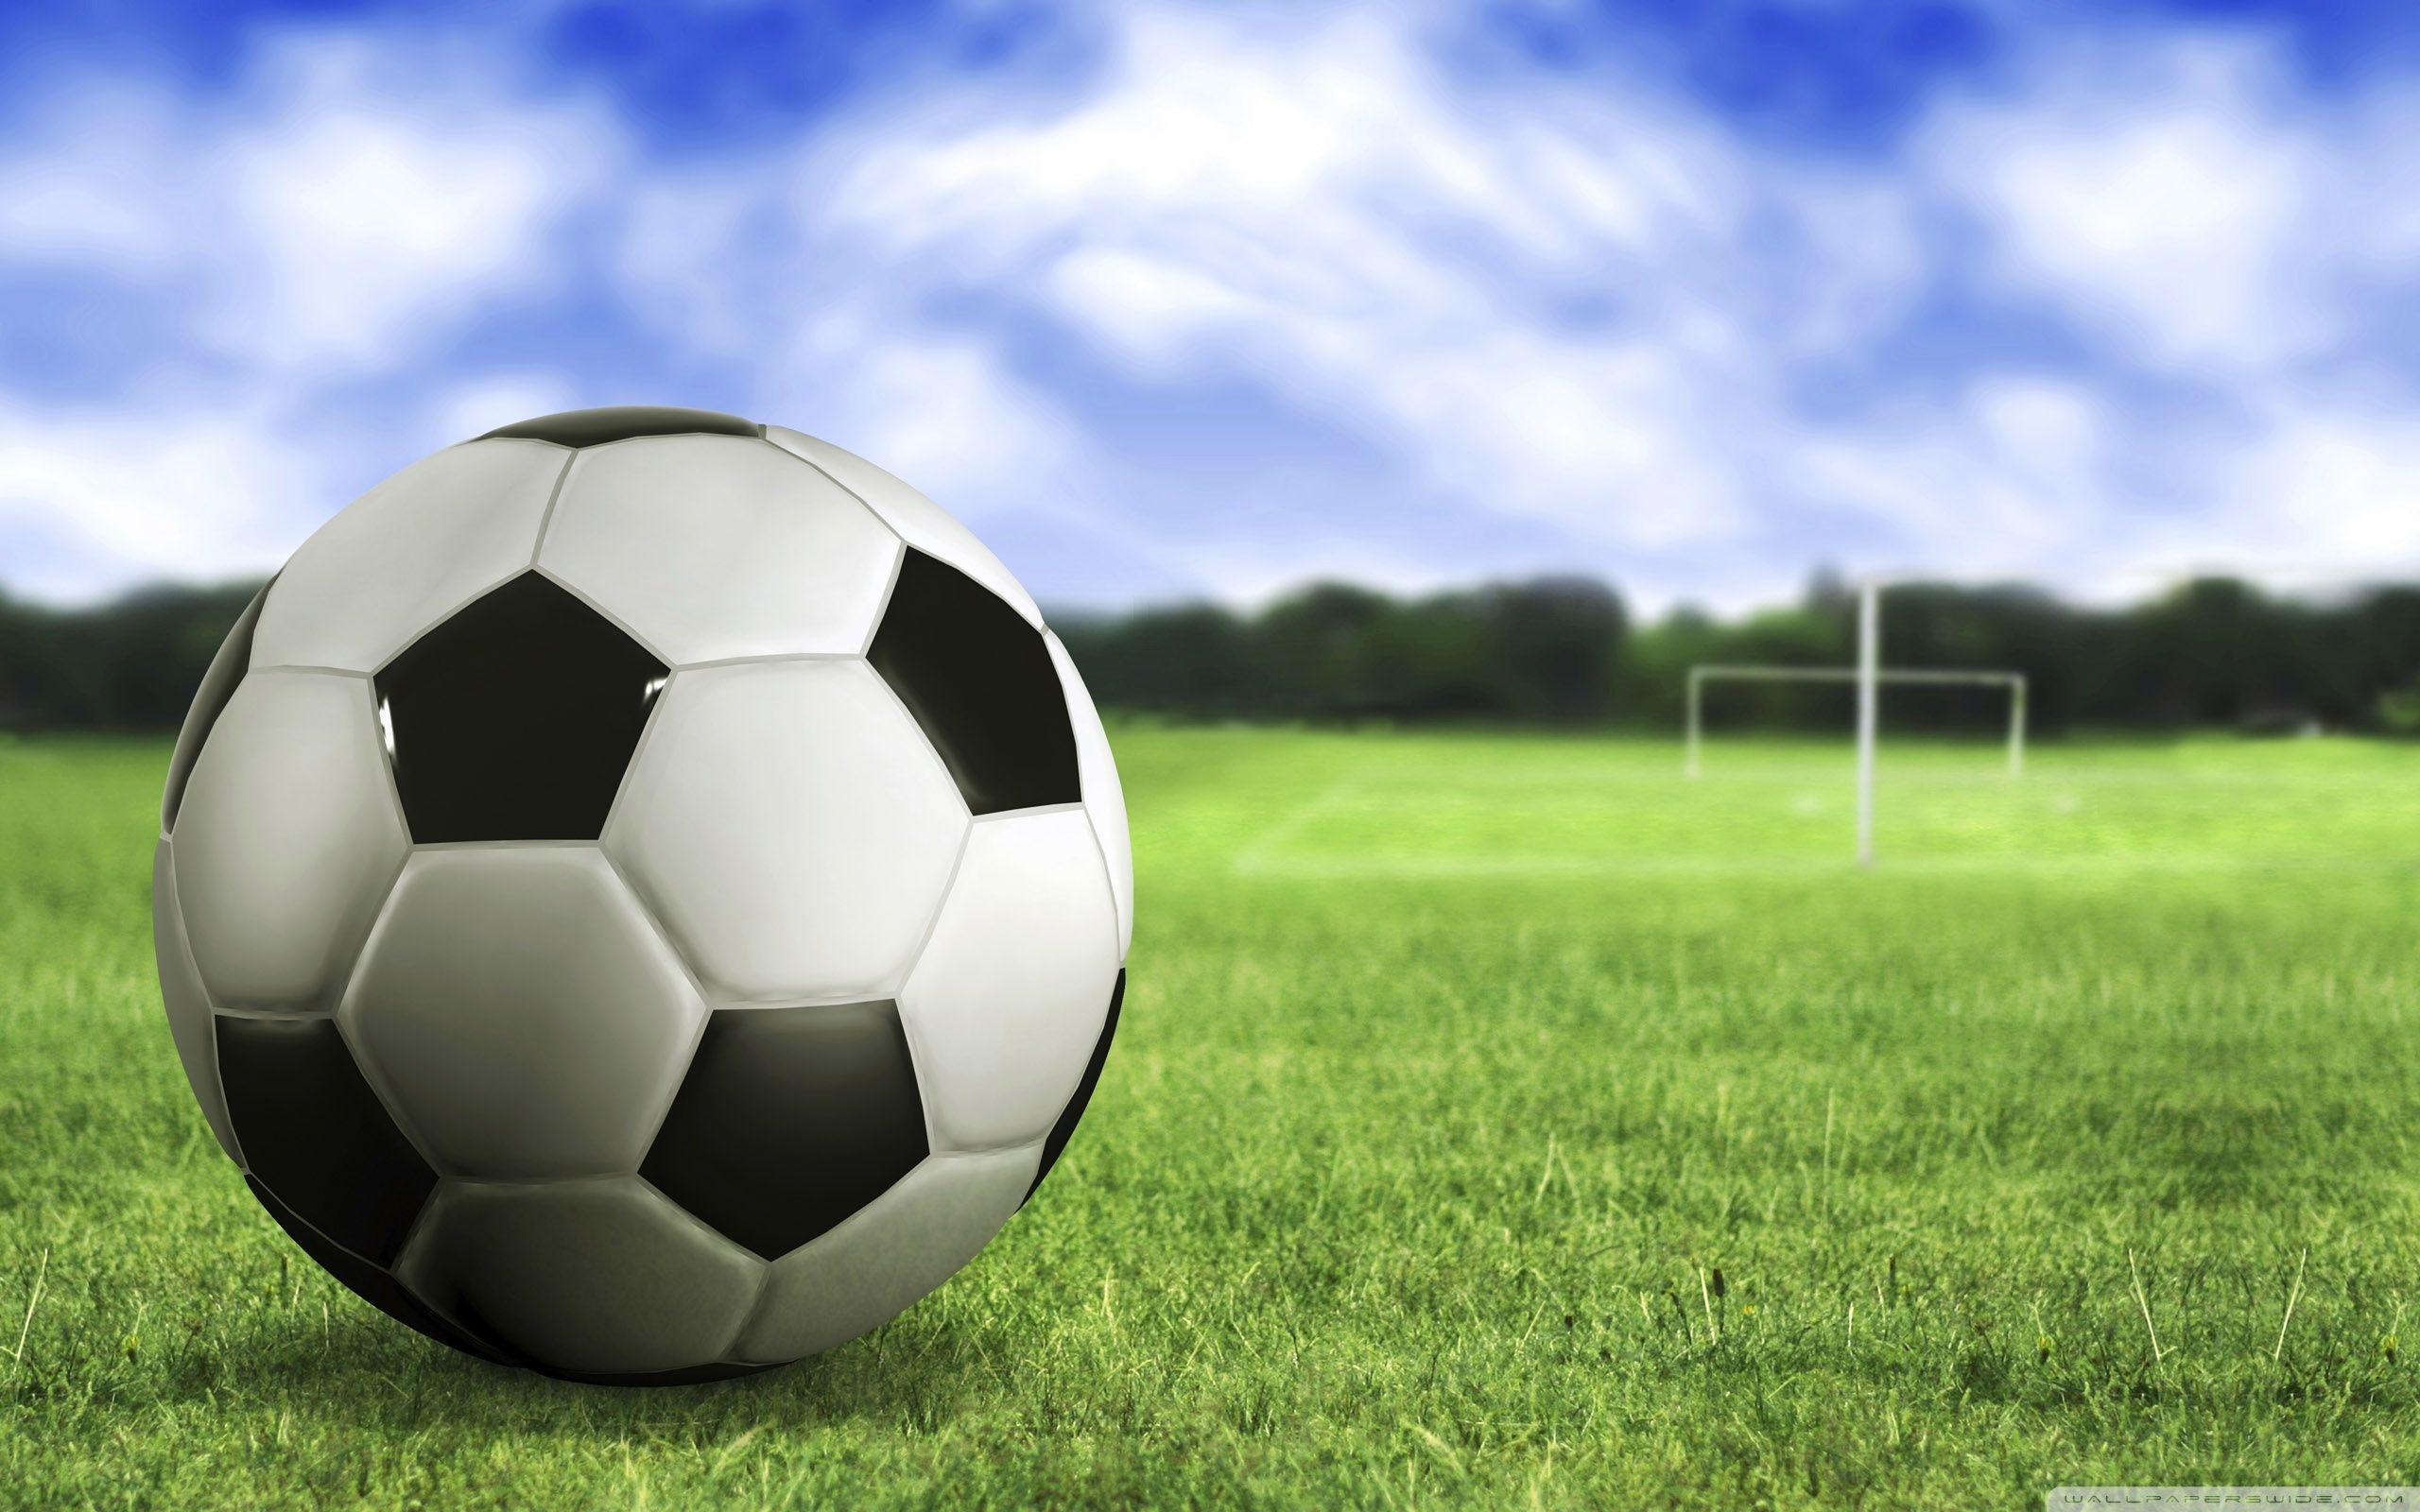 Soccer Ball Wallpapers: Football Ball Wallpapers